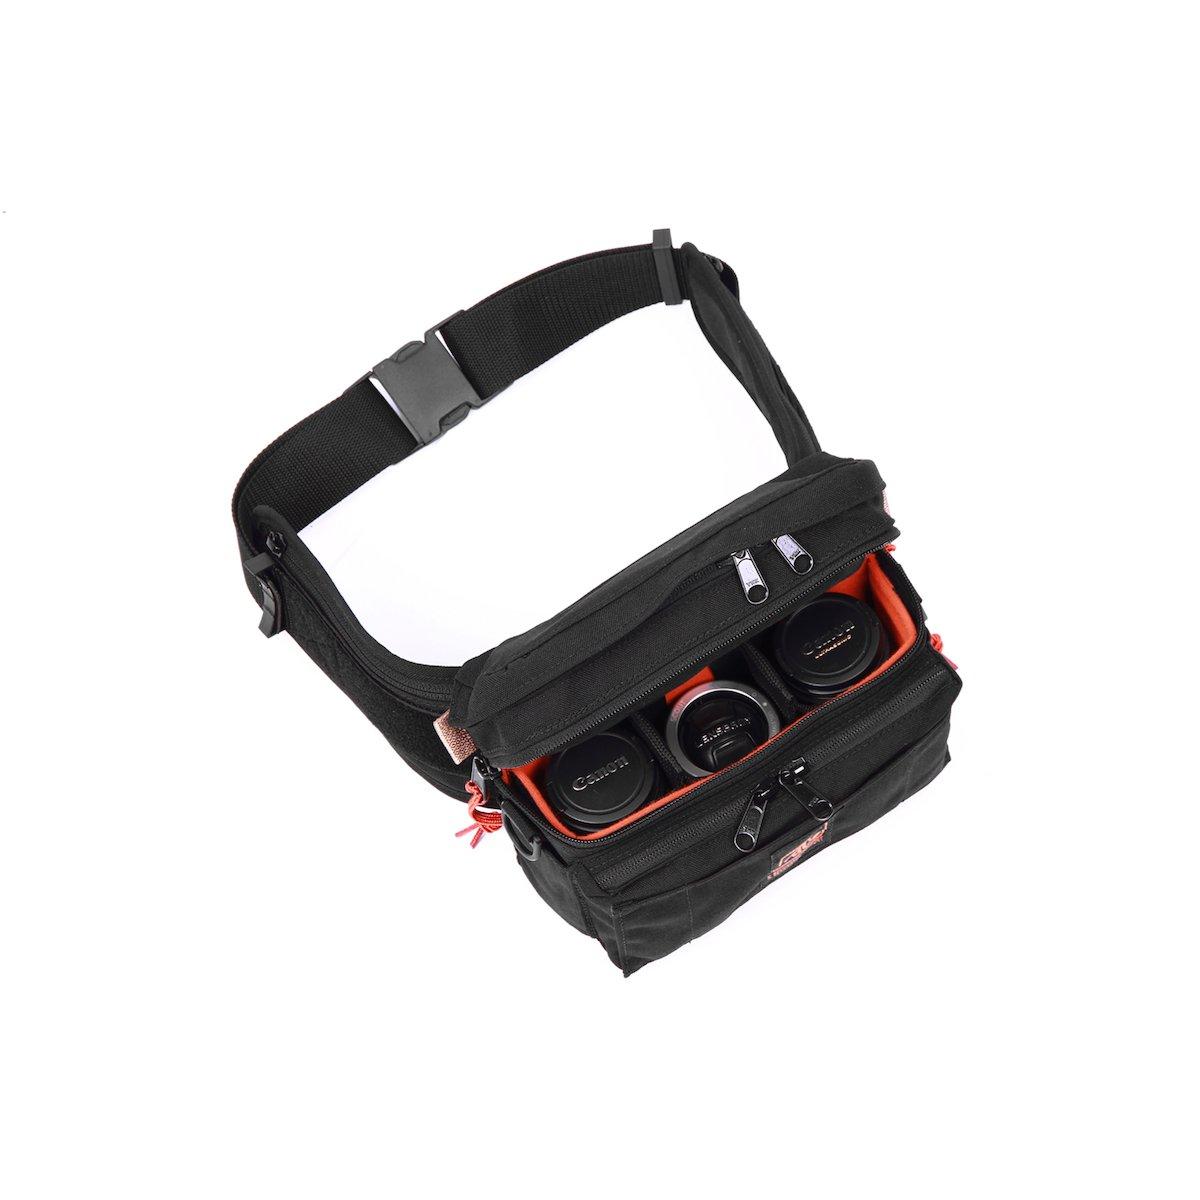 23f2a55ecca3 Portabrace HIP-2 Lens Hip Pack